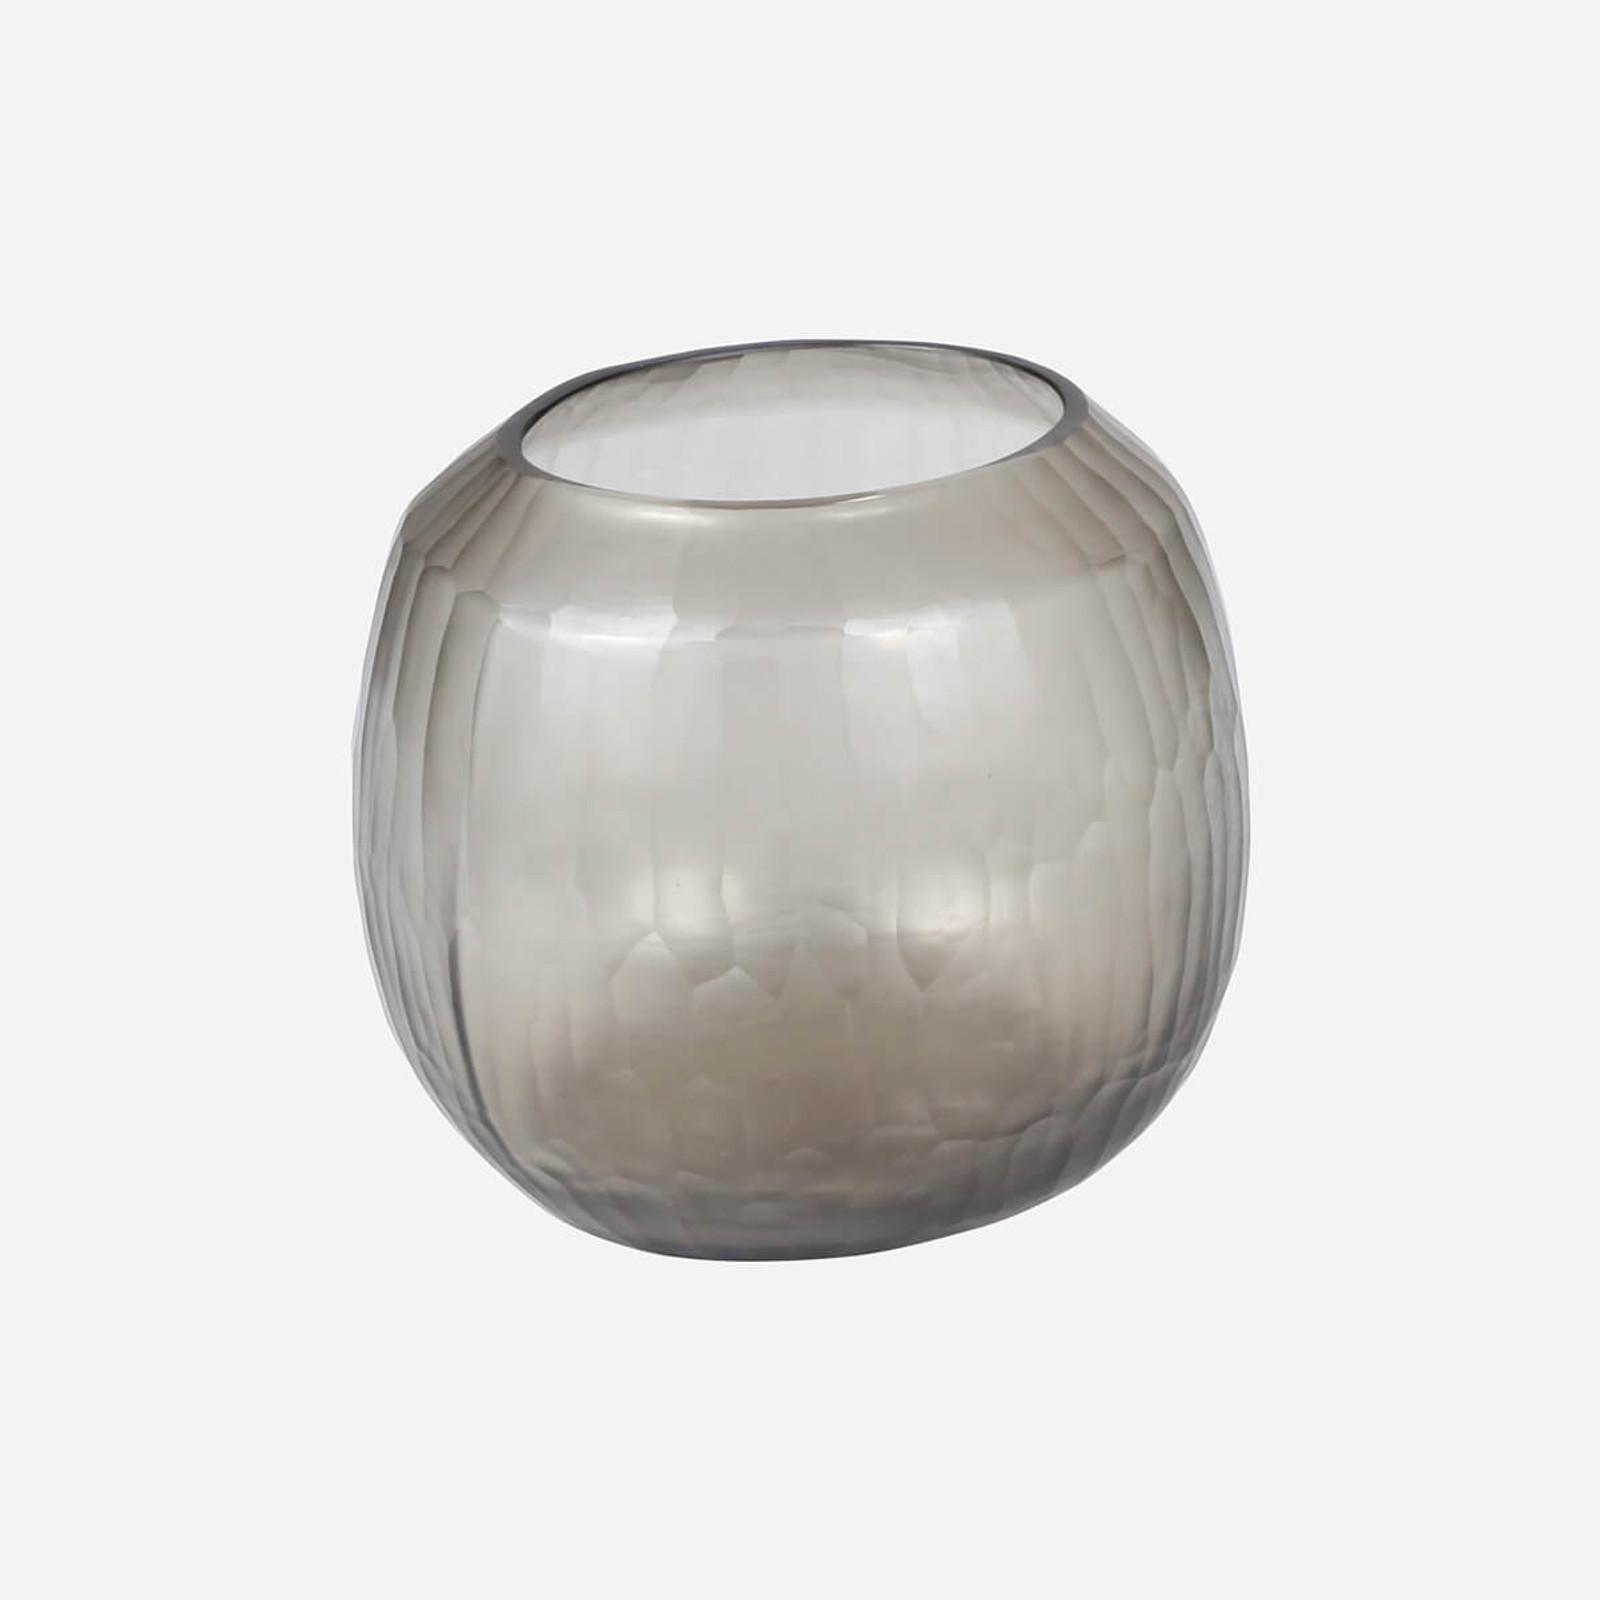 Rhone Medium Vase, Smoke